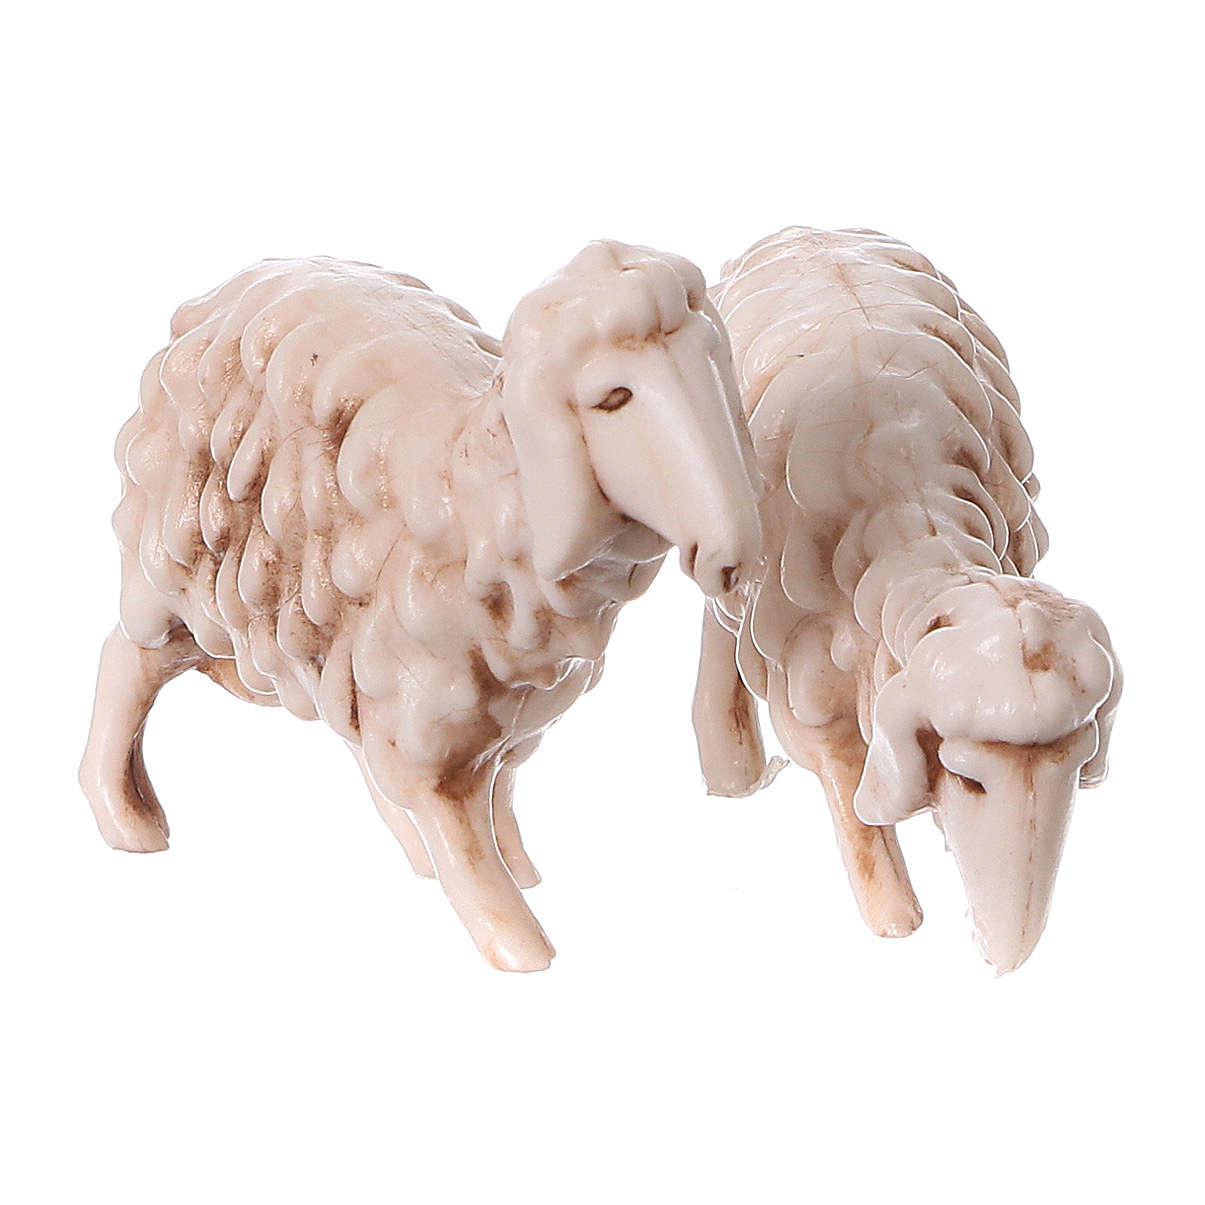 Shepherds with sheep in coloured PVC, Moranduzzo Nativity scene 7 cm, Children's Line 4